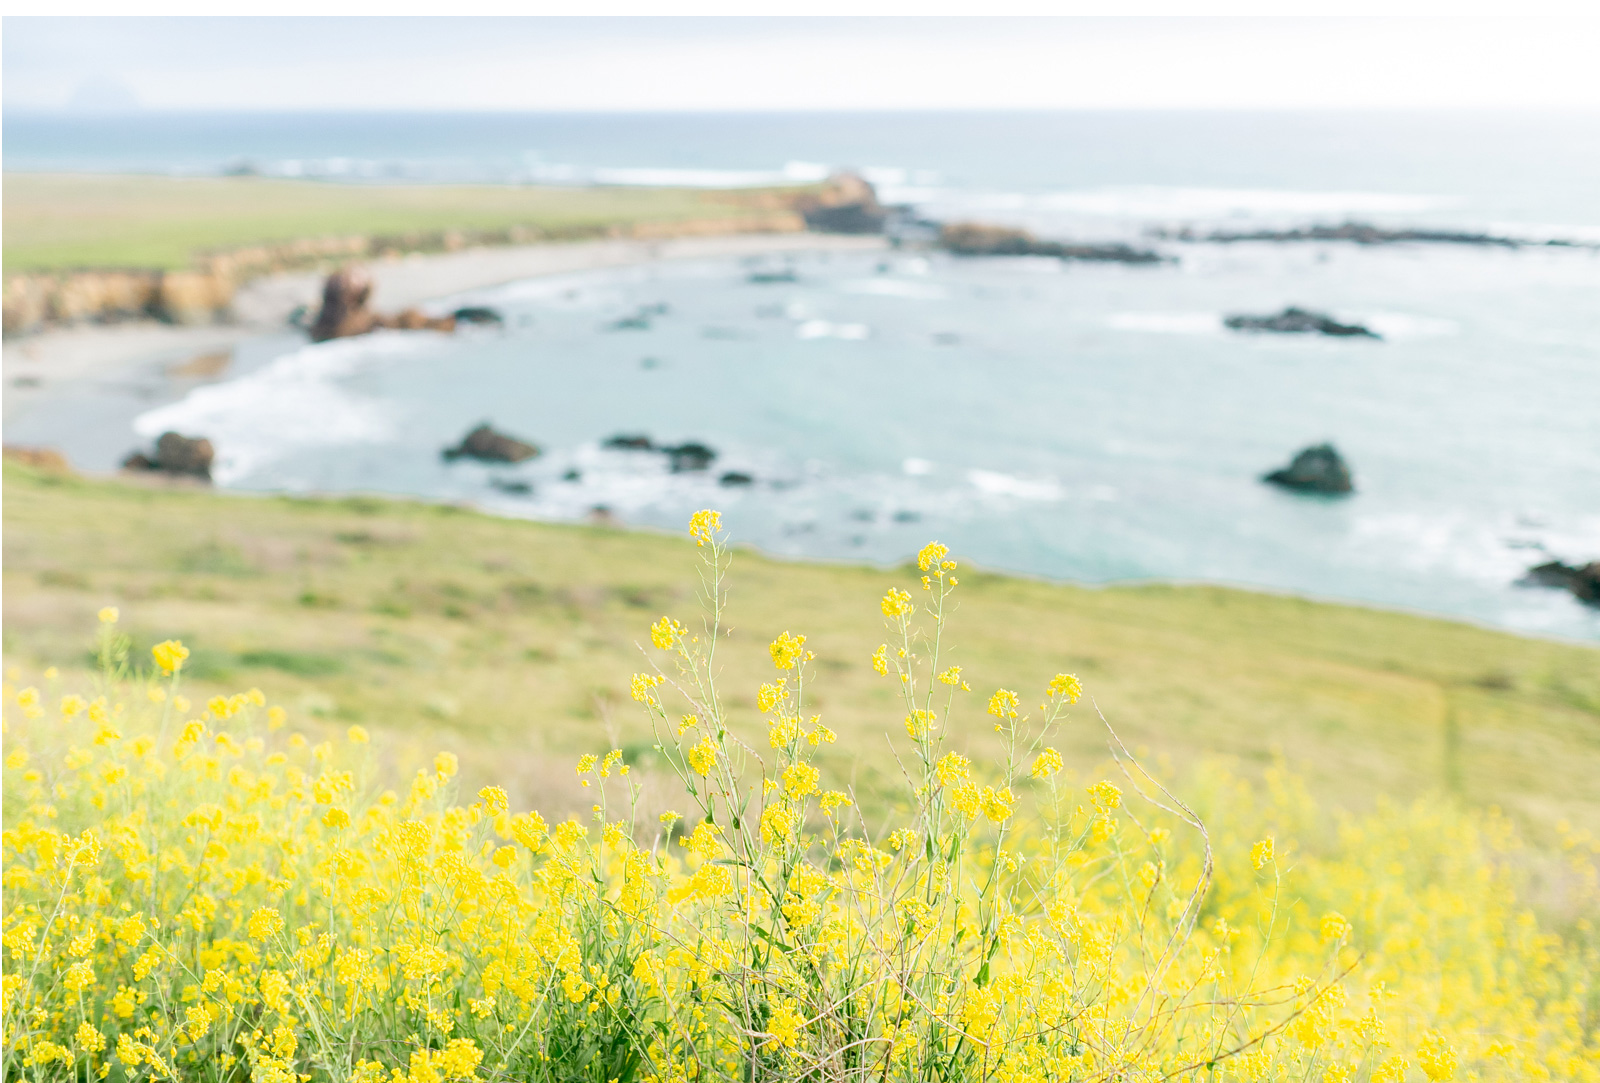 Saddlerock-Ranch-Malibu-Wedding-Natalie-Schutt-Photography-Romantic-Florals-Rolling-Hills-Engagement_20.jpg